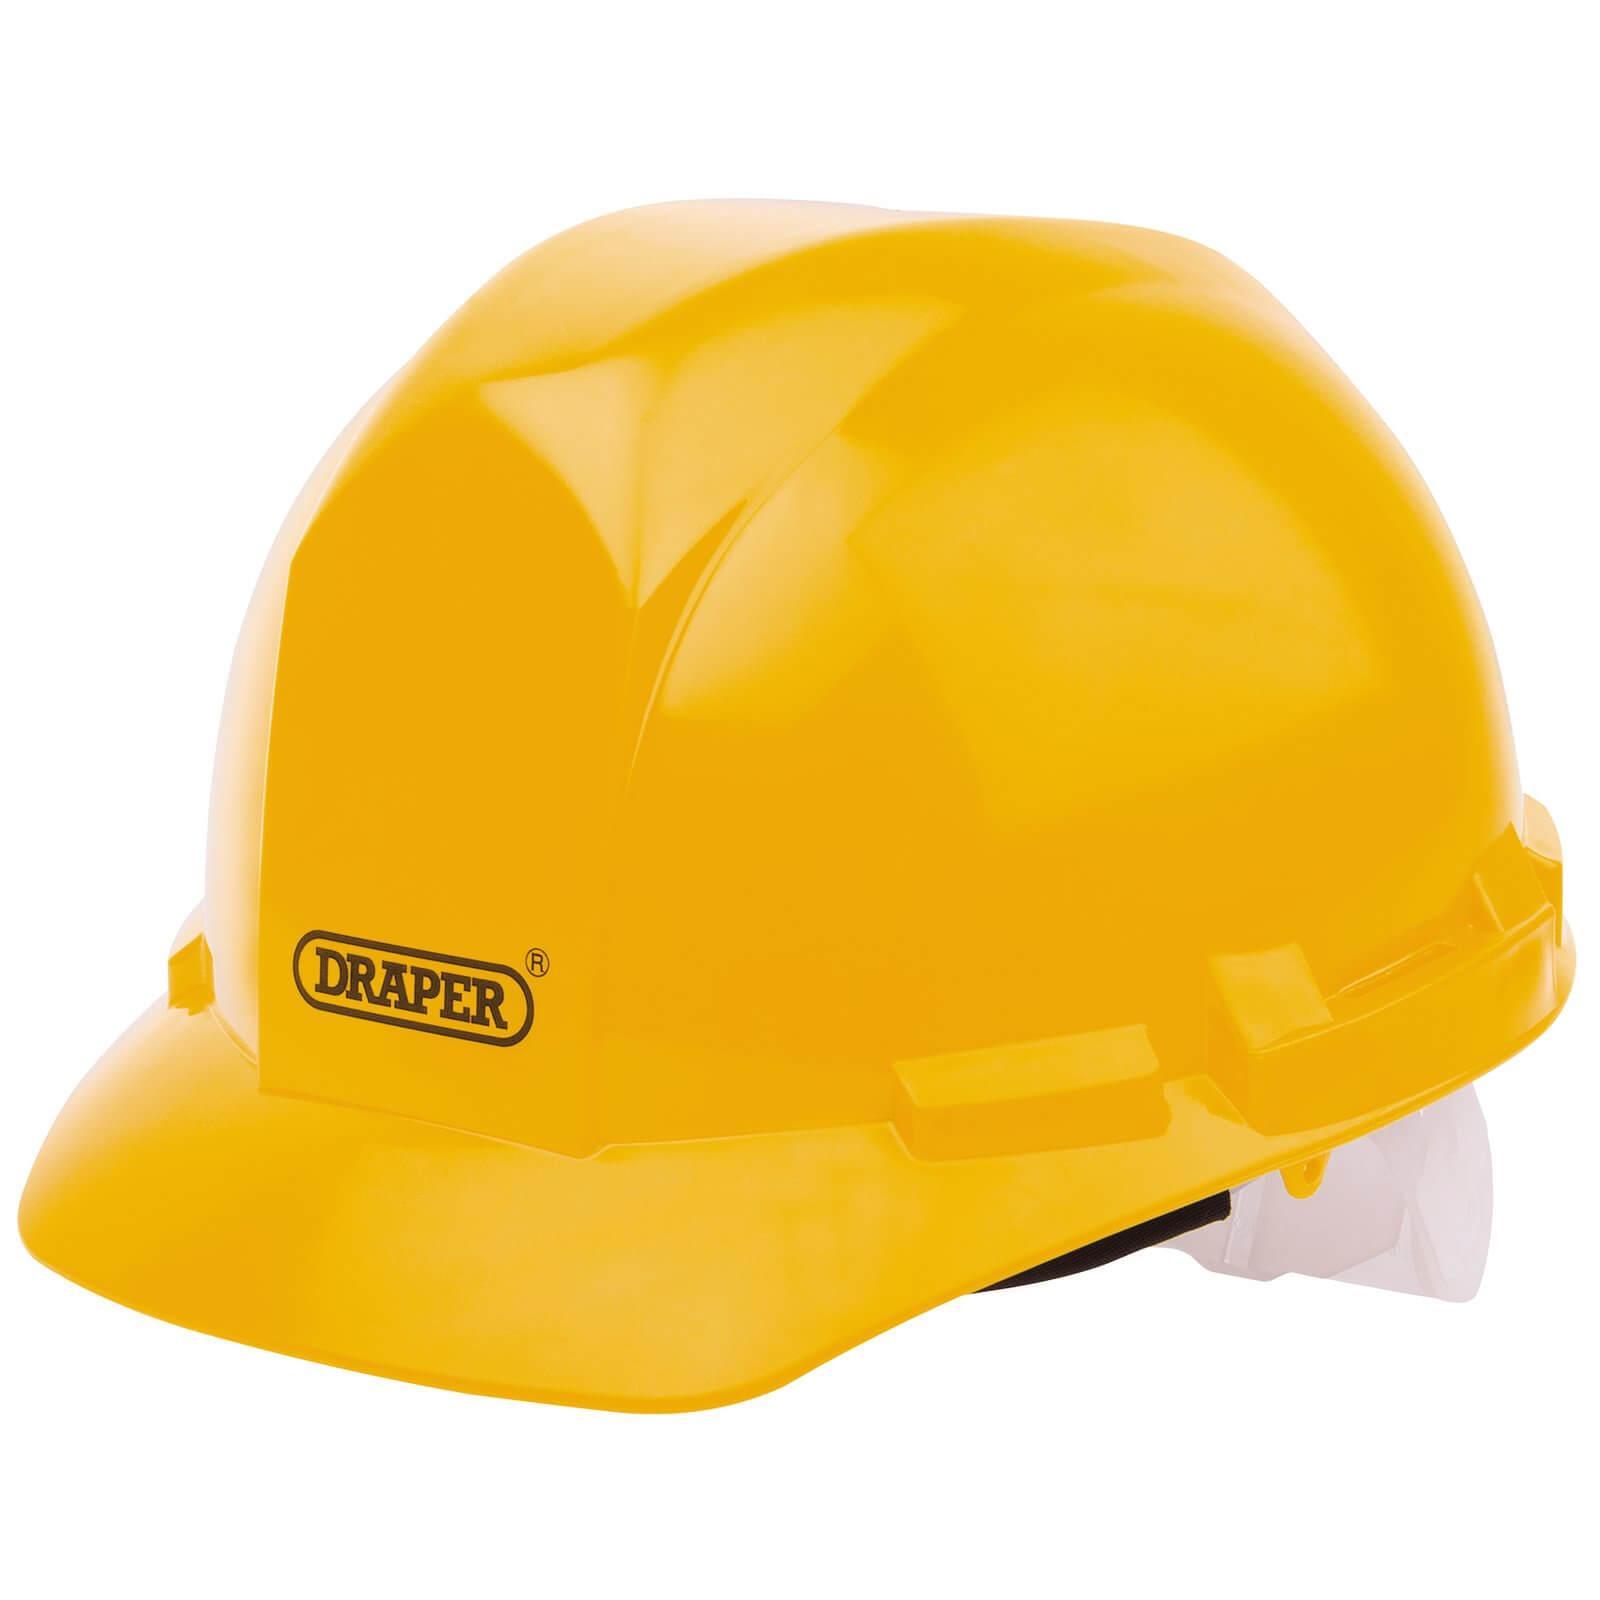 Draper Hard Hat Safety Helmet Yellow